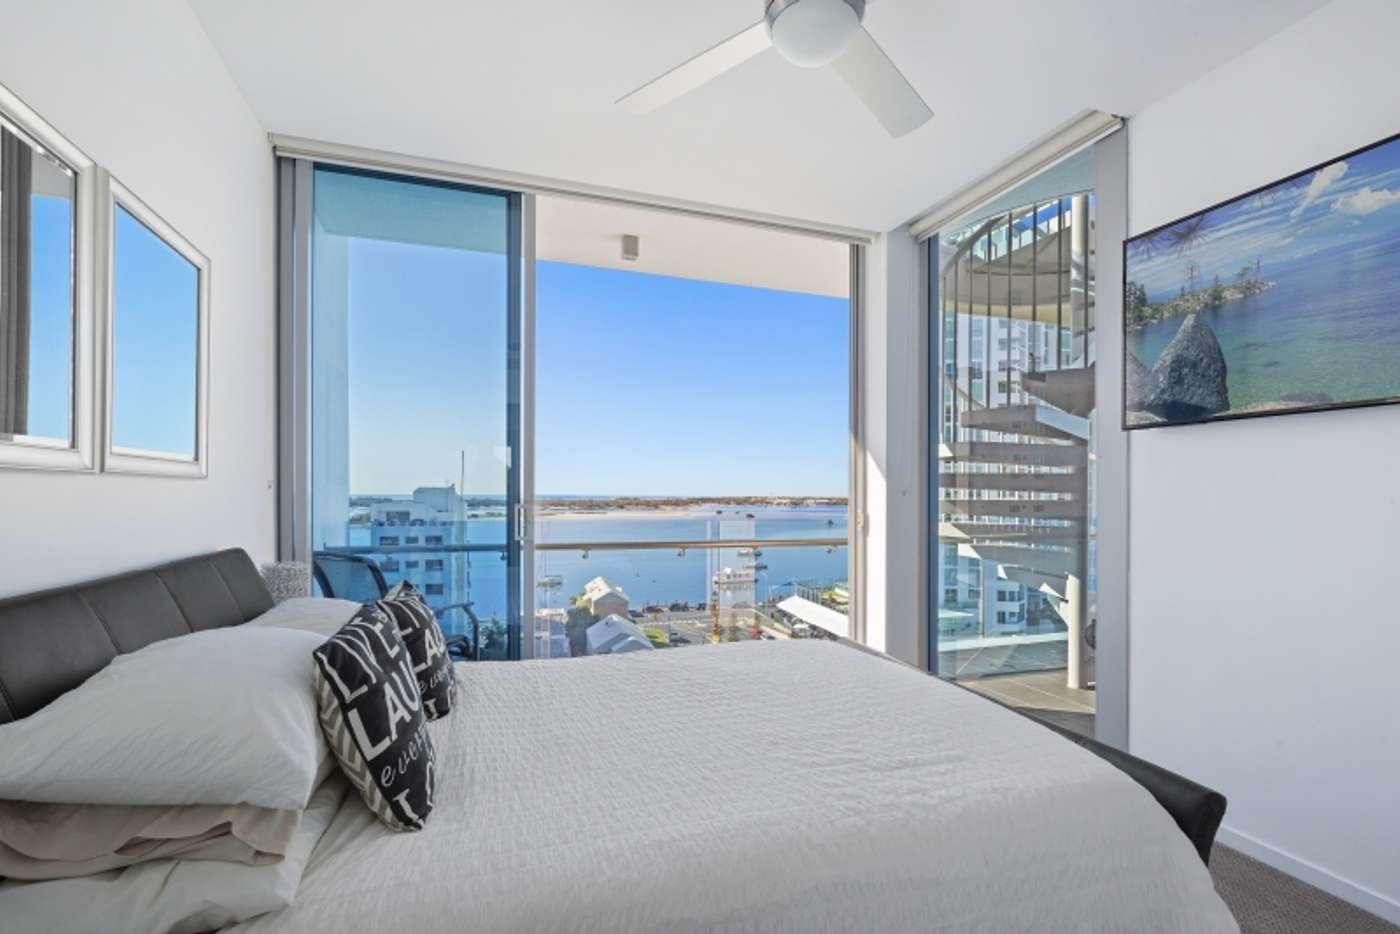 Seventh view of Homely apartment listing, 802/20 Labrador Street, Labrador QLD 4215